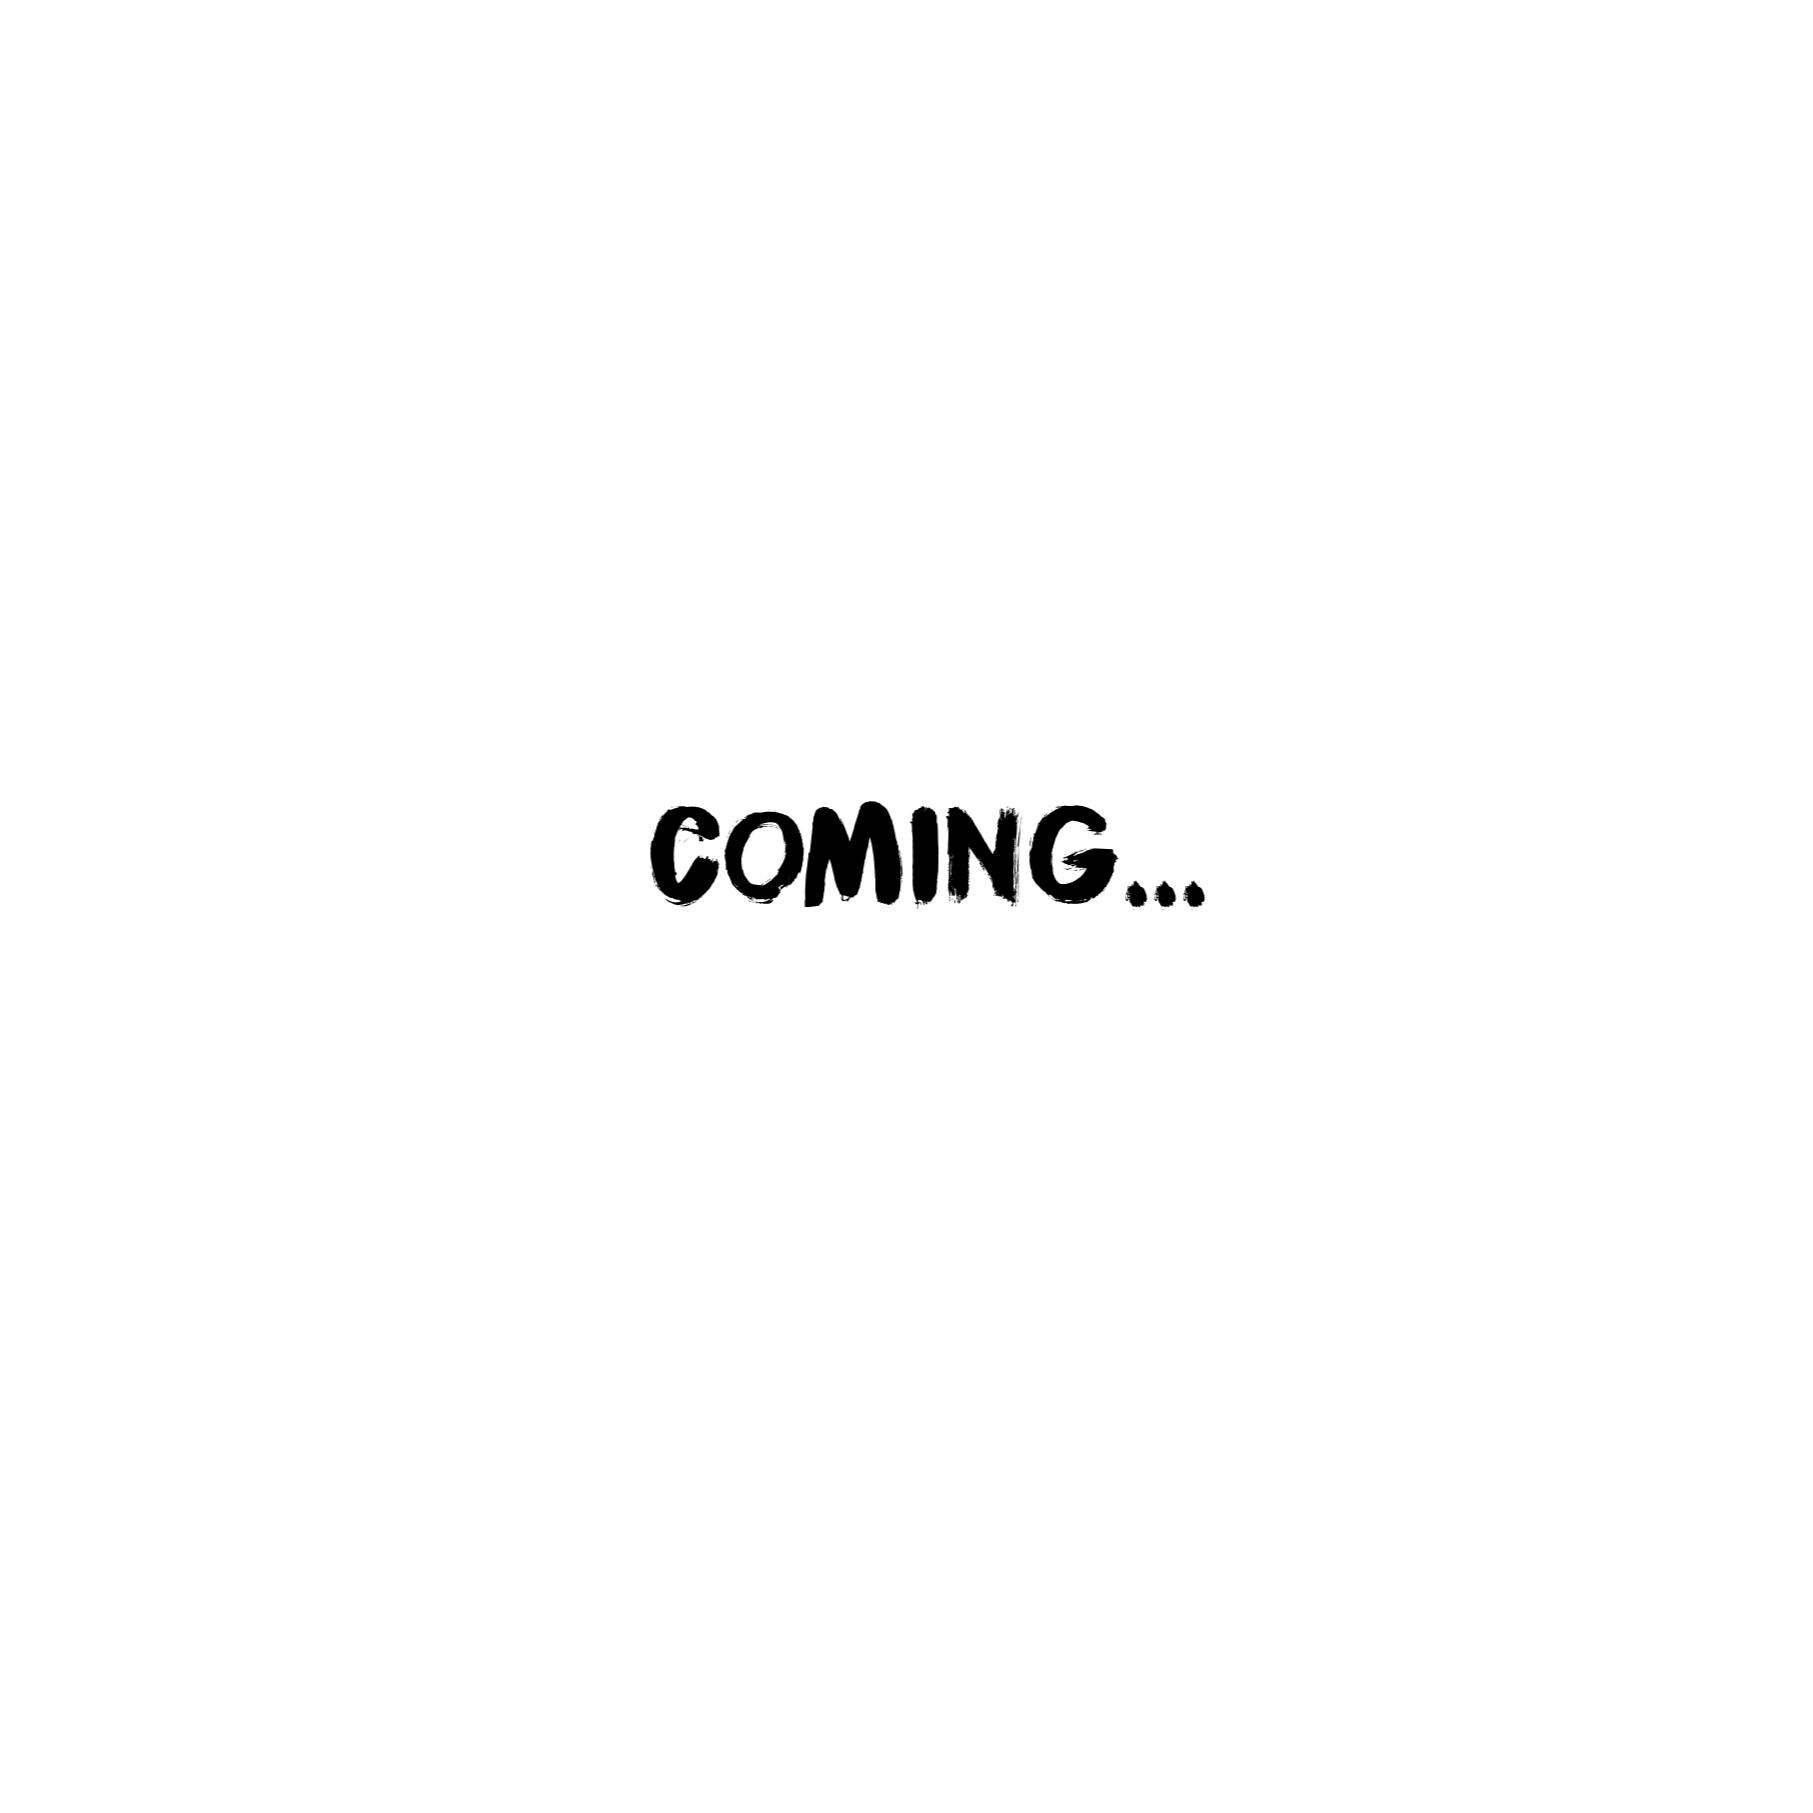 Coming....jpg